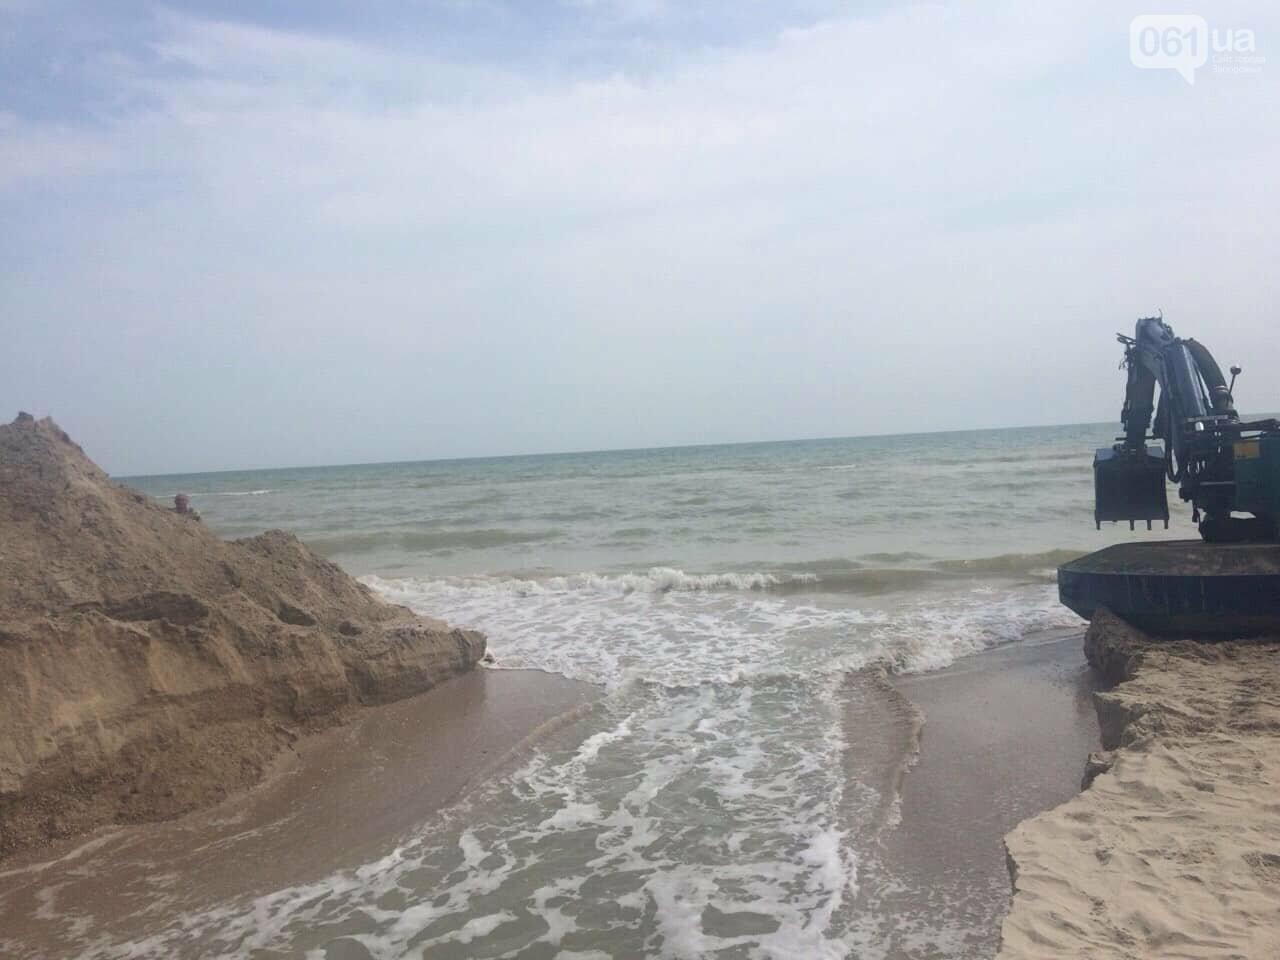 Промоину, соединяющую лиман с Азовским морем, открыли, - ФОТО , фото-3